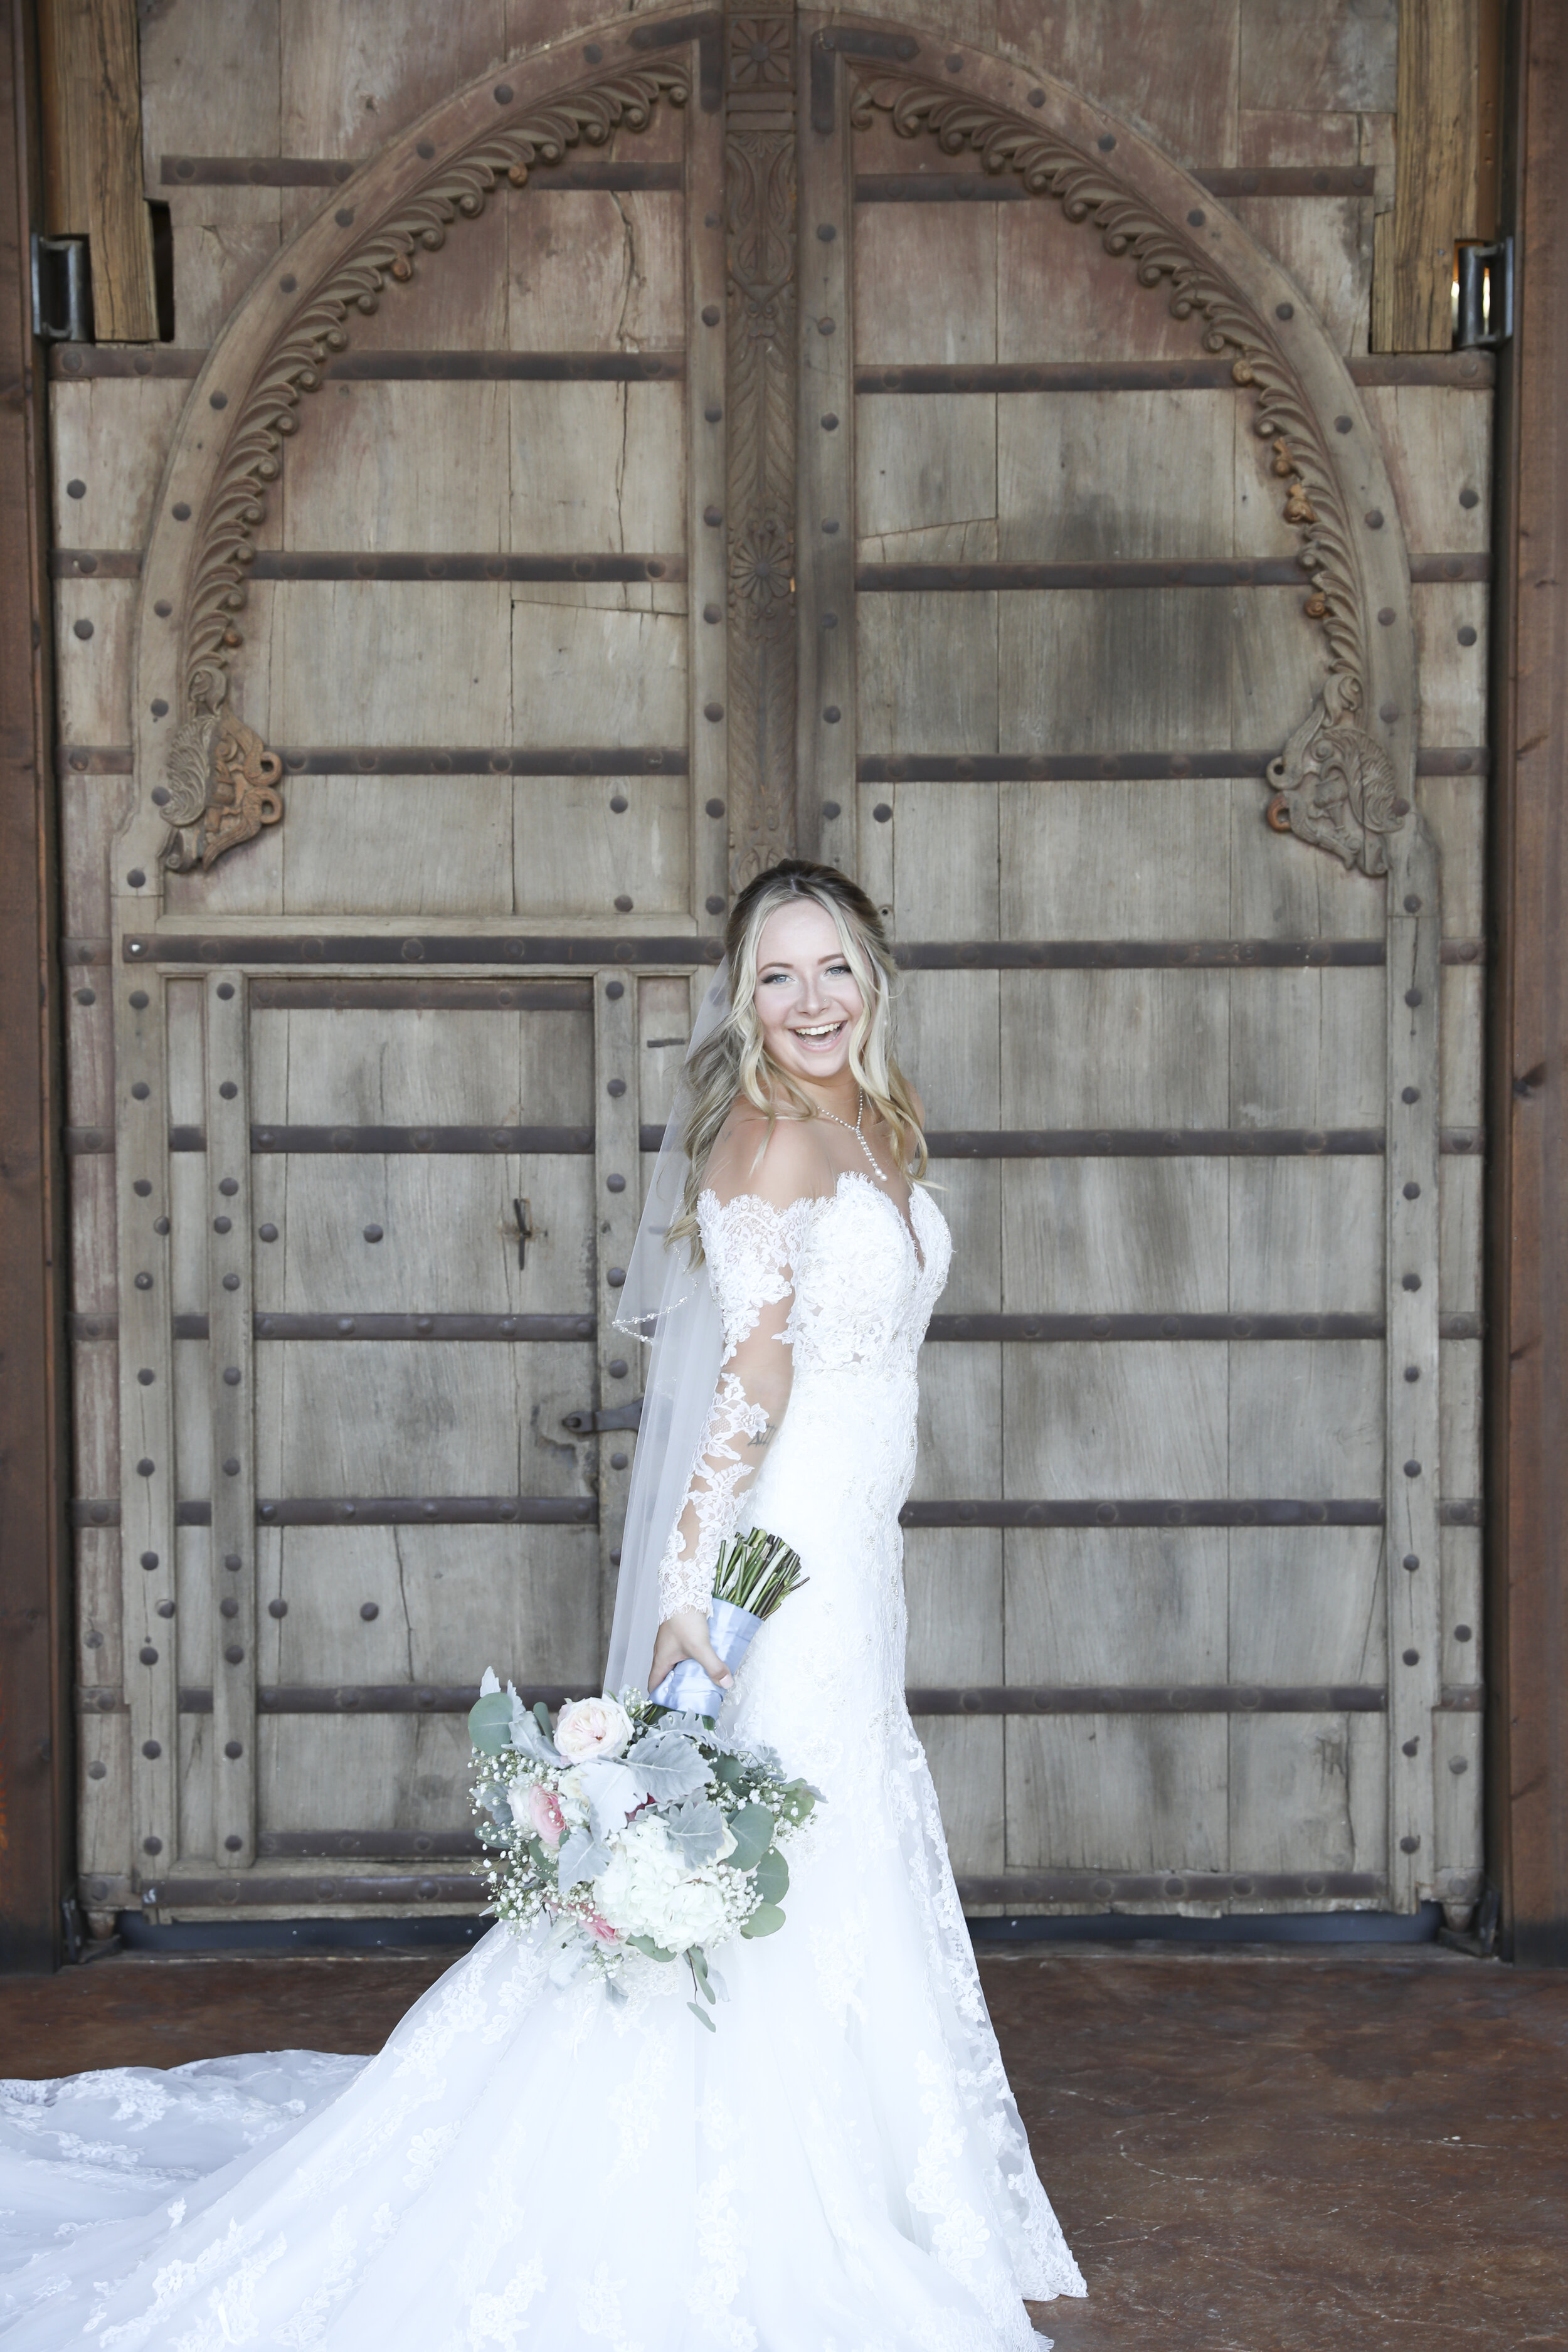 RandiMichelle_GannWedding_Bridal Portraits-19.jpg